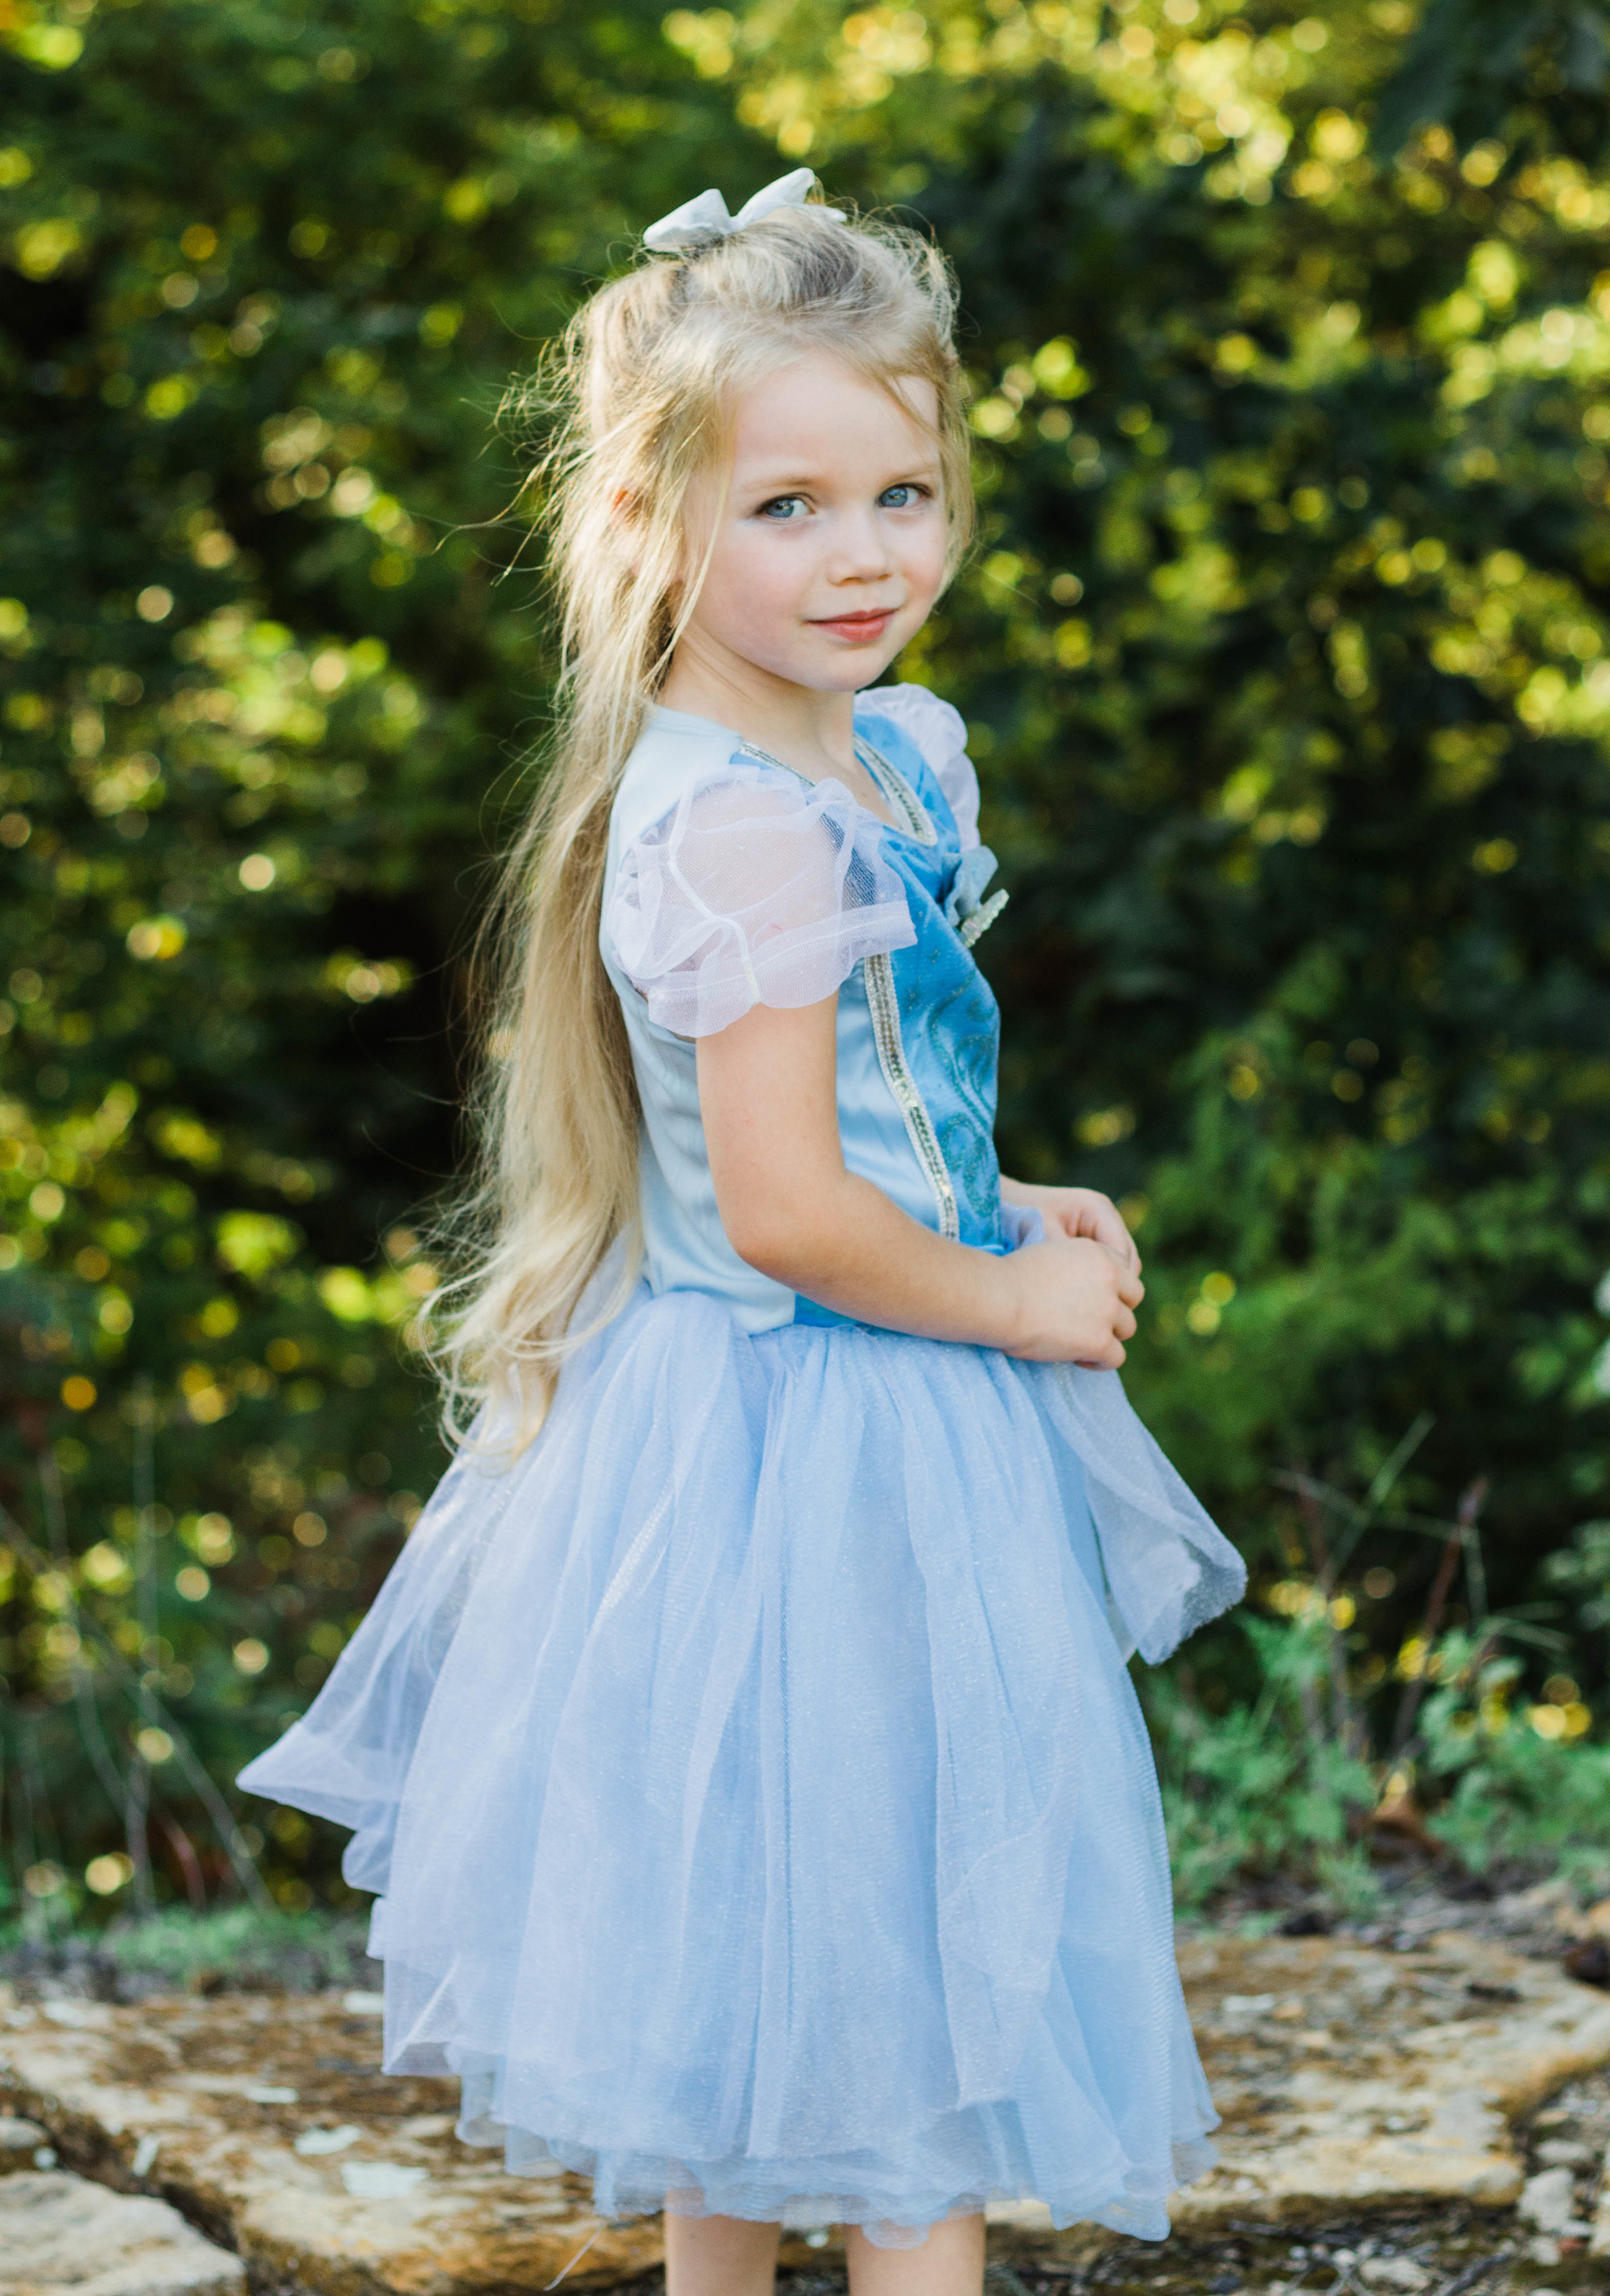 princessriley-2.jpg